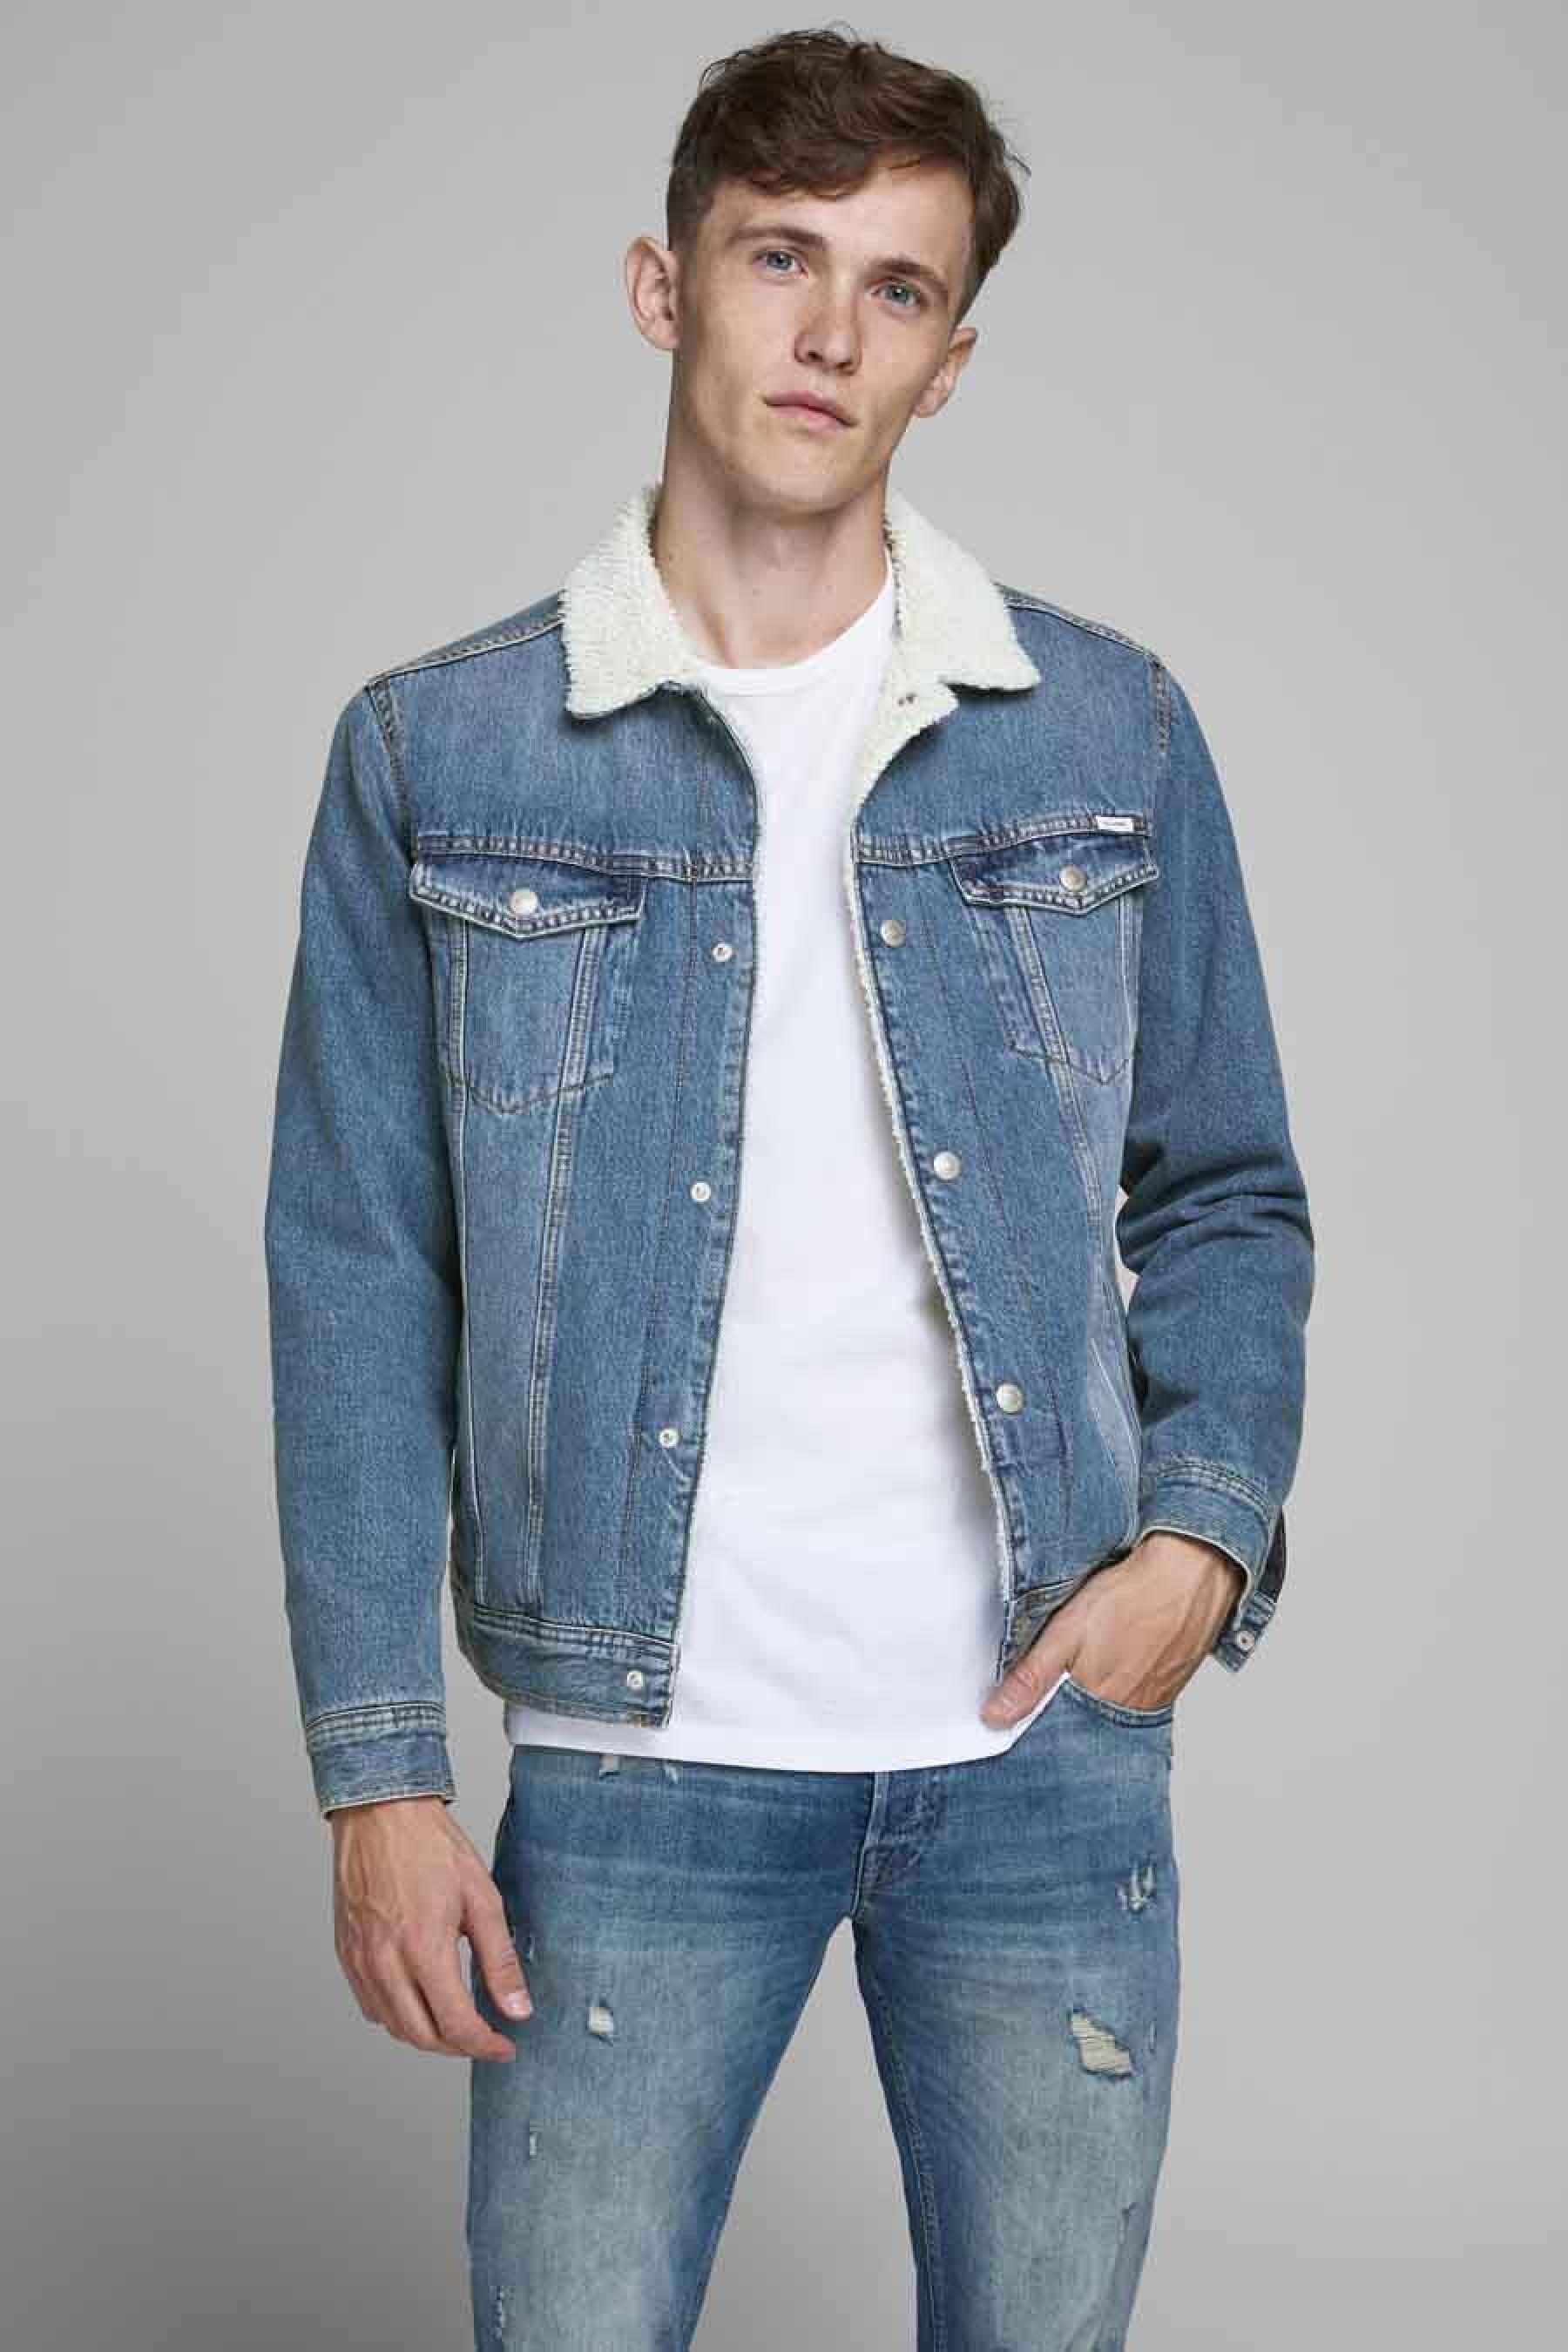 Jack & Jones Jeans Intelligenc Jas jeans, Denim, Heren, Maat: L/M/S